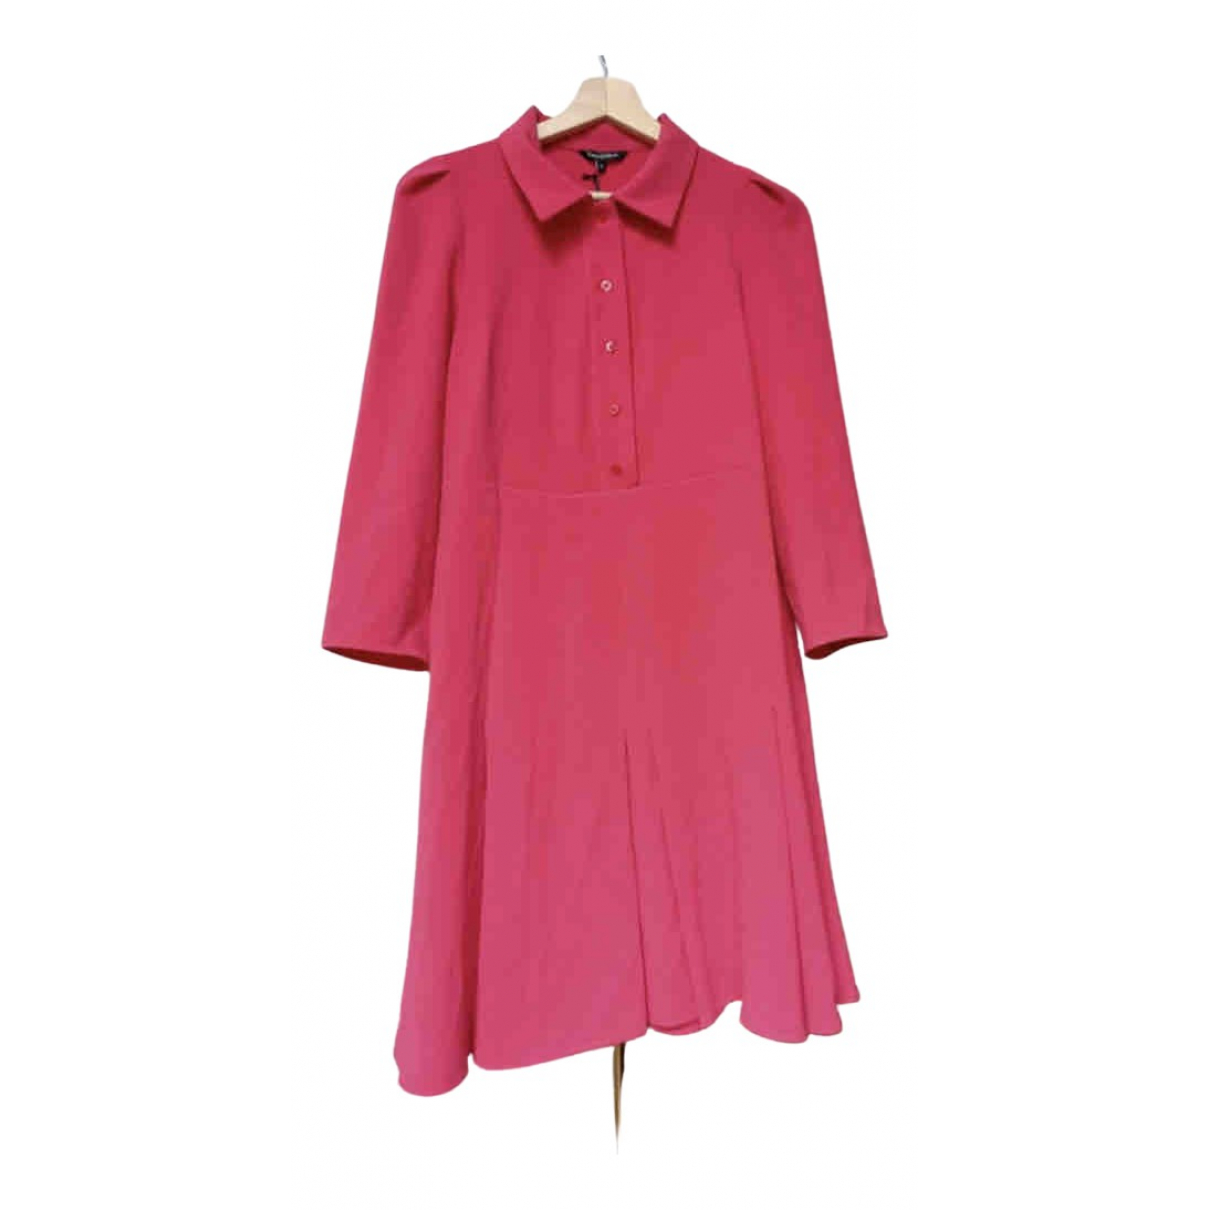 Tara Jarmon \N Kleid in  Rosa Polyester